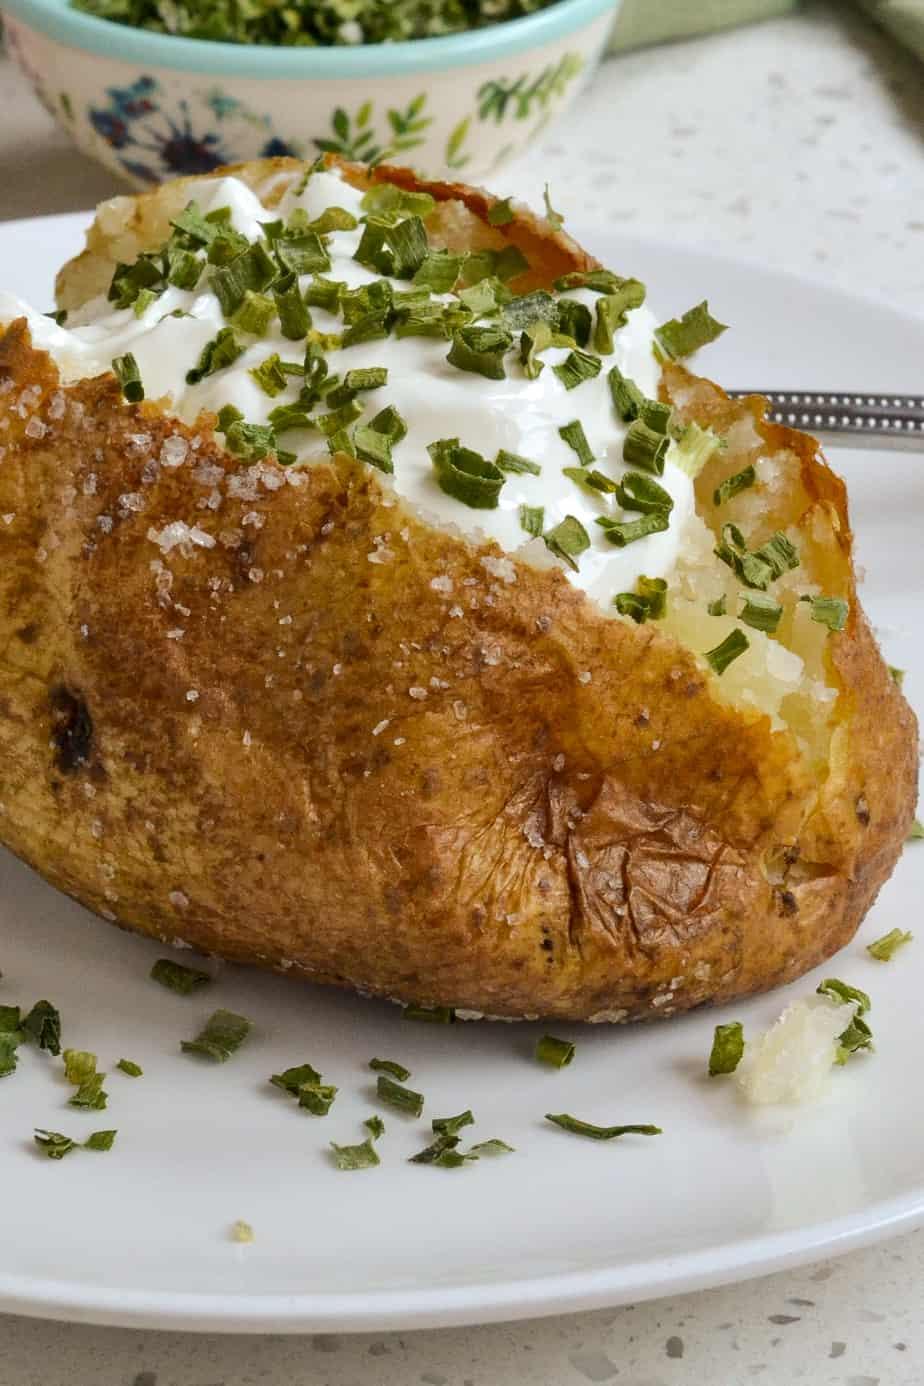 Crispy oven baked steakhouse style potato.